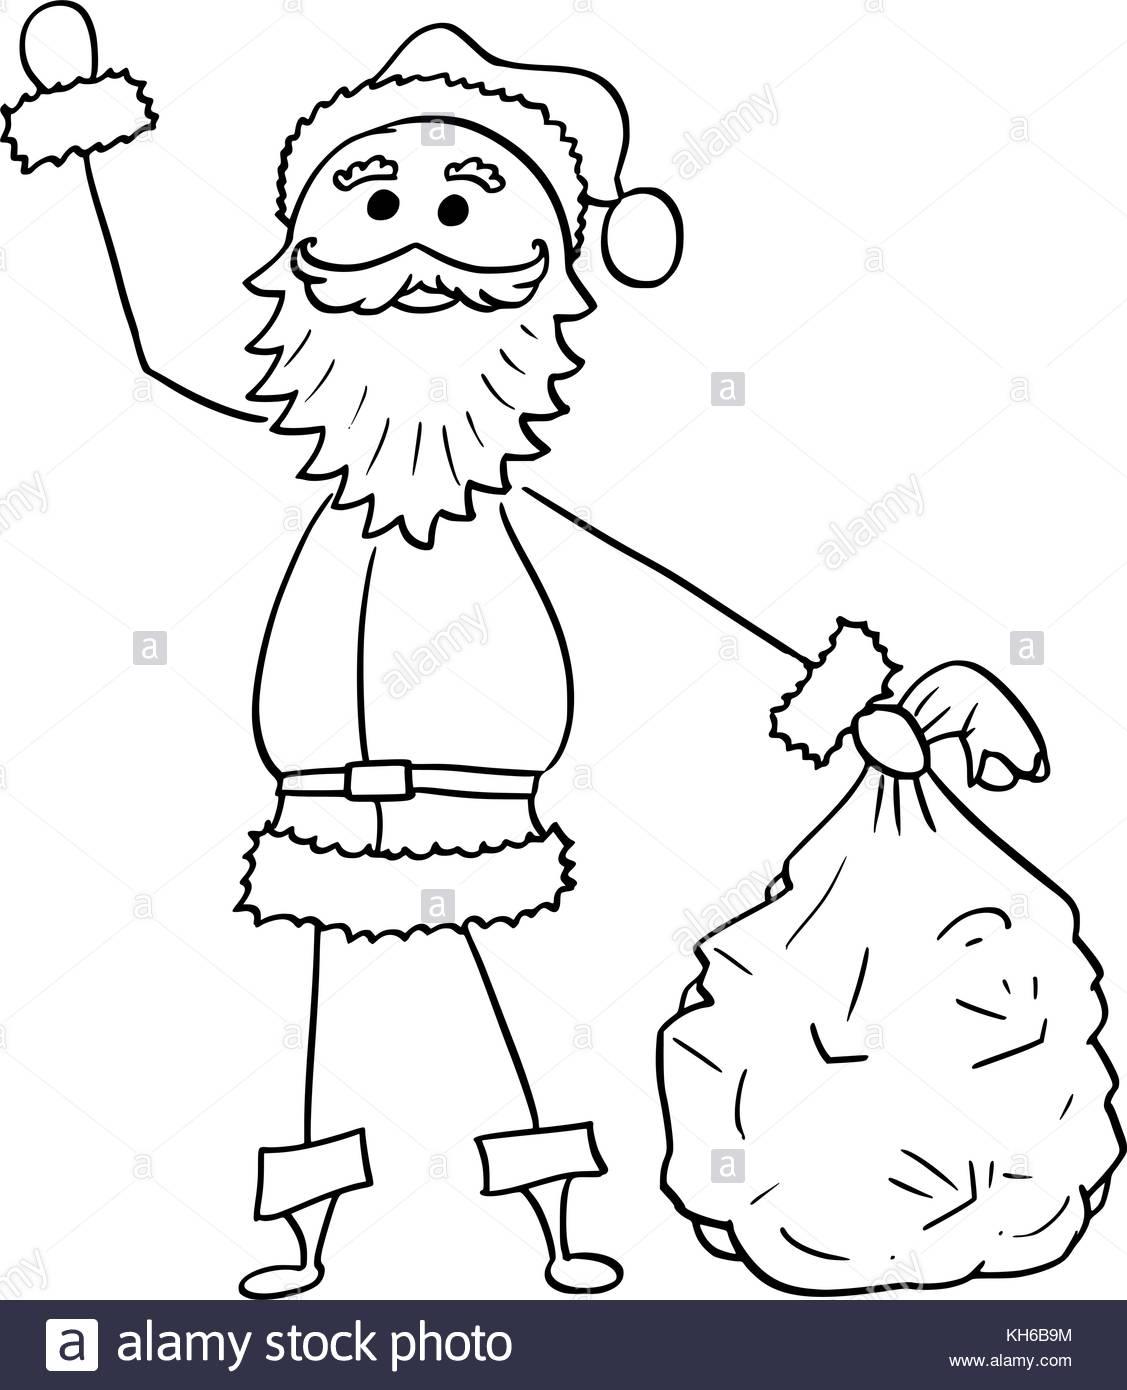 1127x1390 Cartoon Drawing Illustration Of Christmas Santa Claus Holding Bag